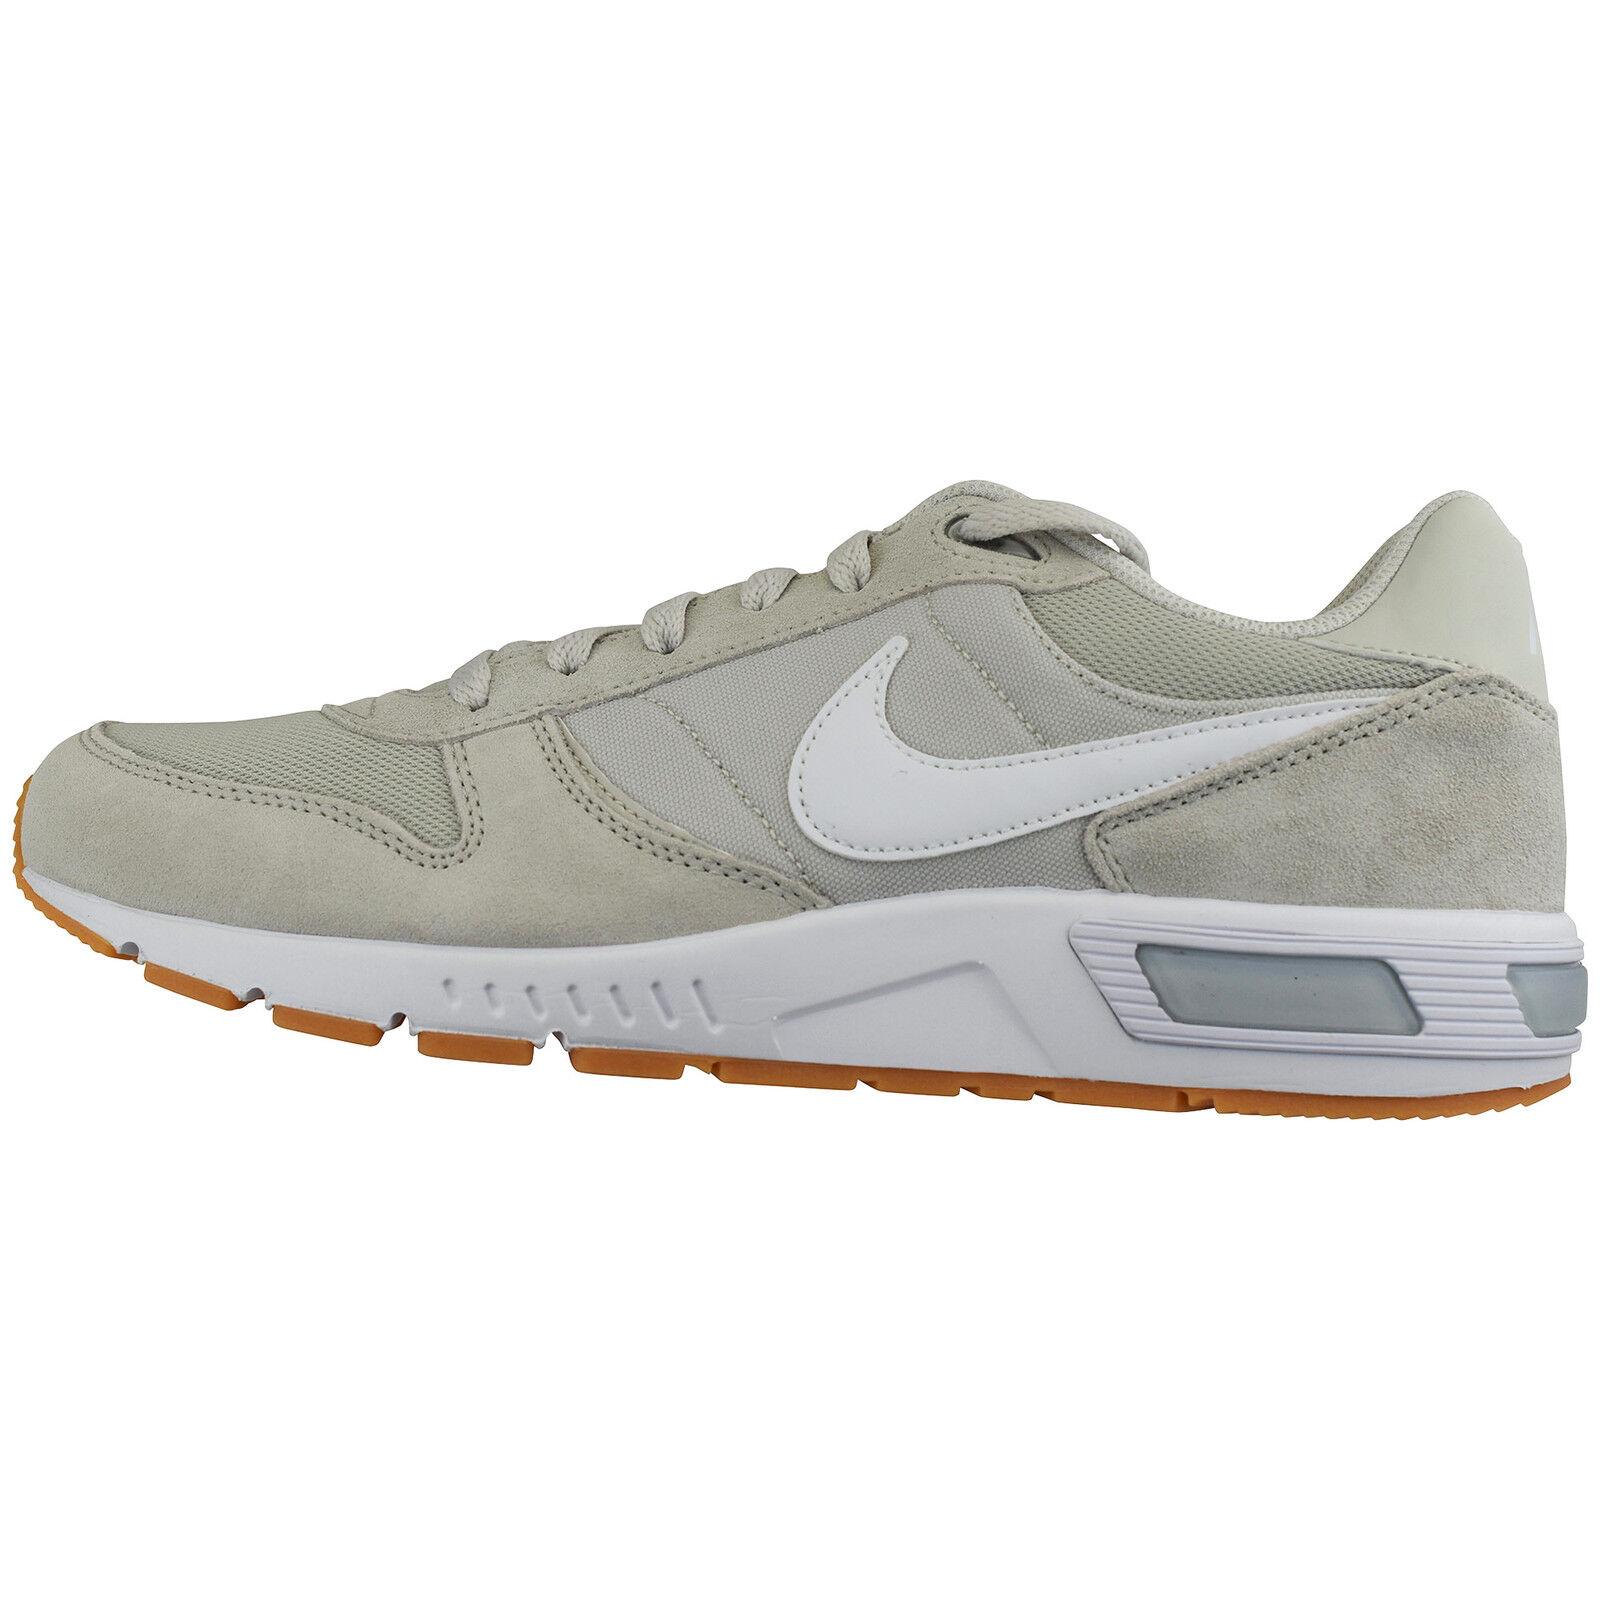 Nike Nightgazer Schuh 644402-020 Classic Lifestyle Freizeit Schuh Nightgazer Sneaker e9b2c3